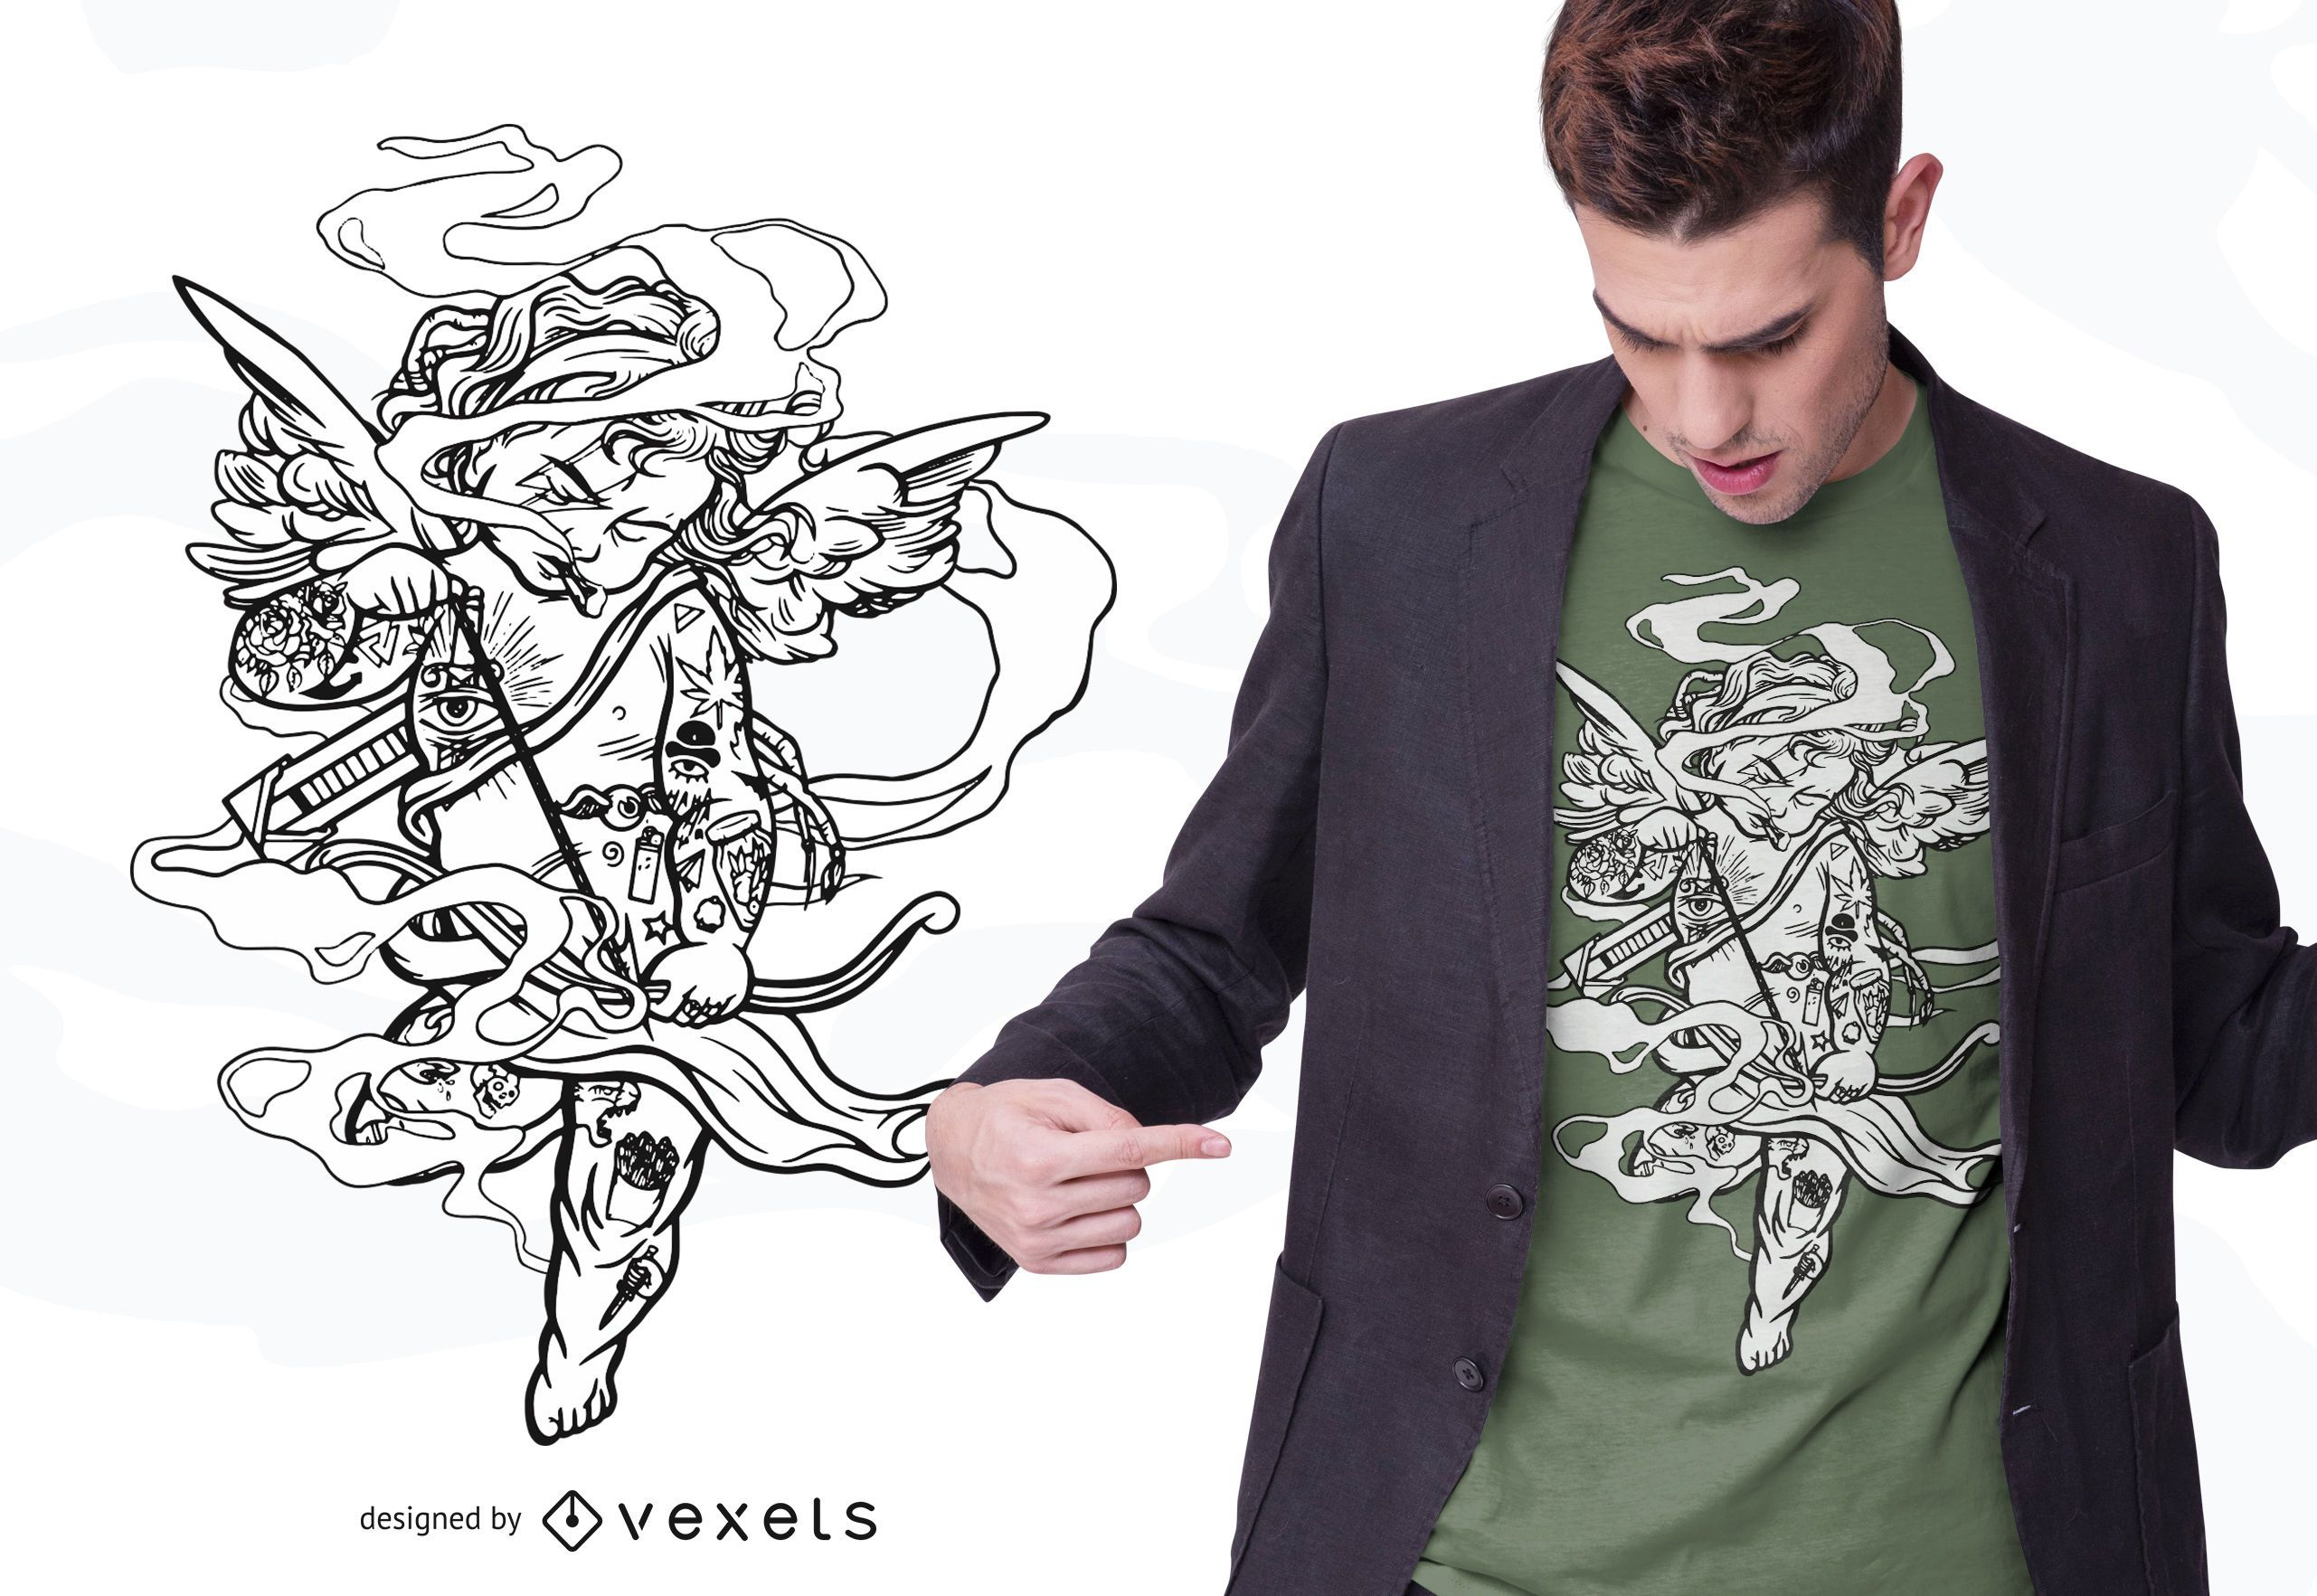 Trashy Cupid T-shirt Design